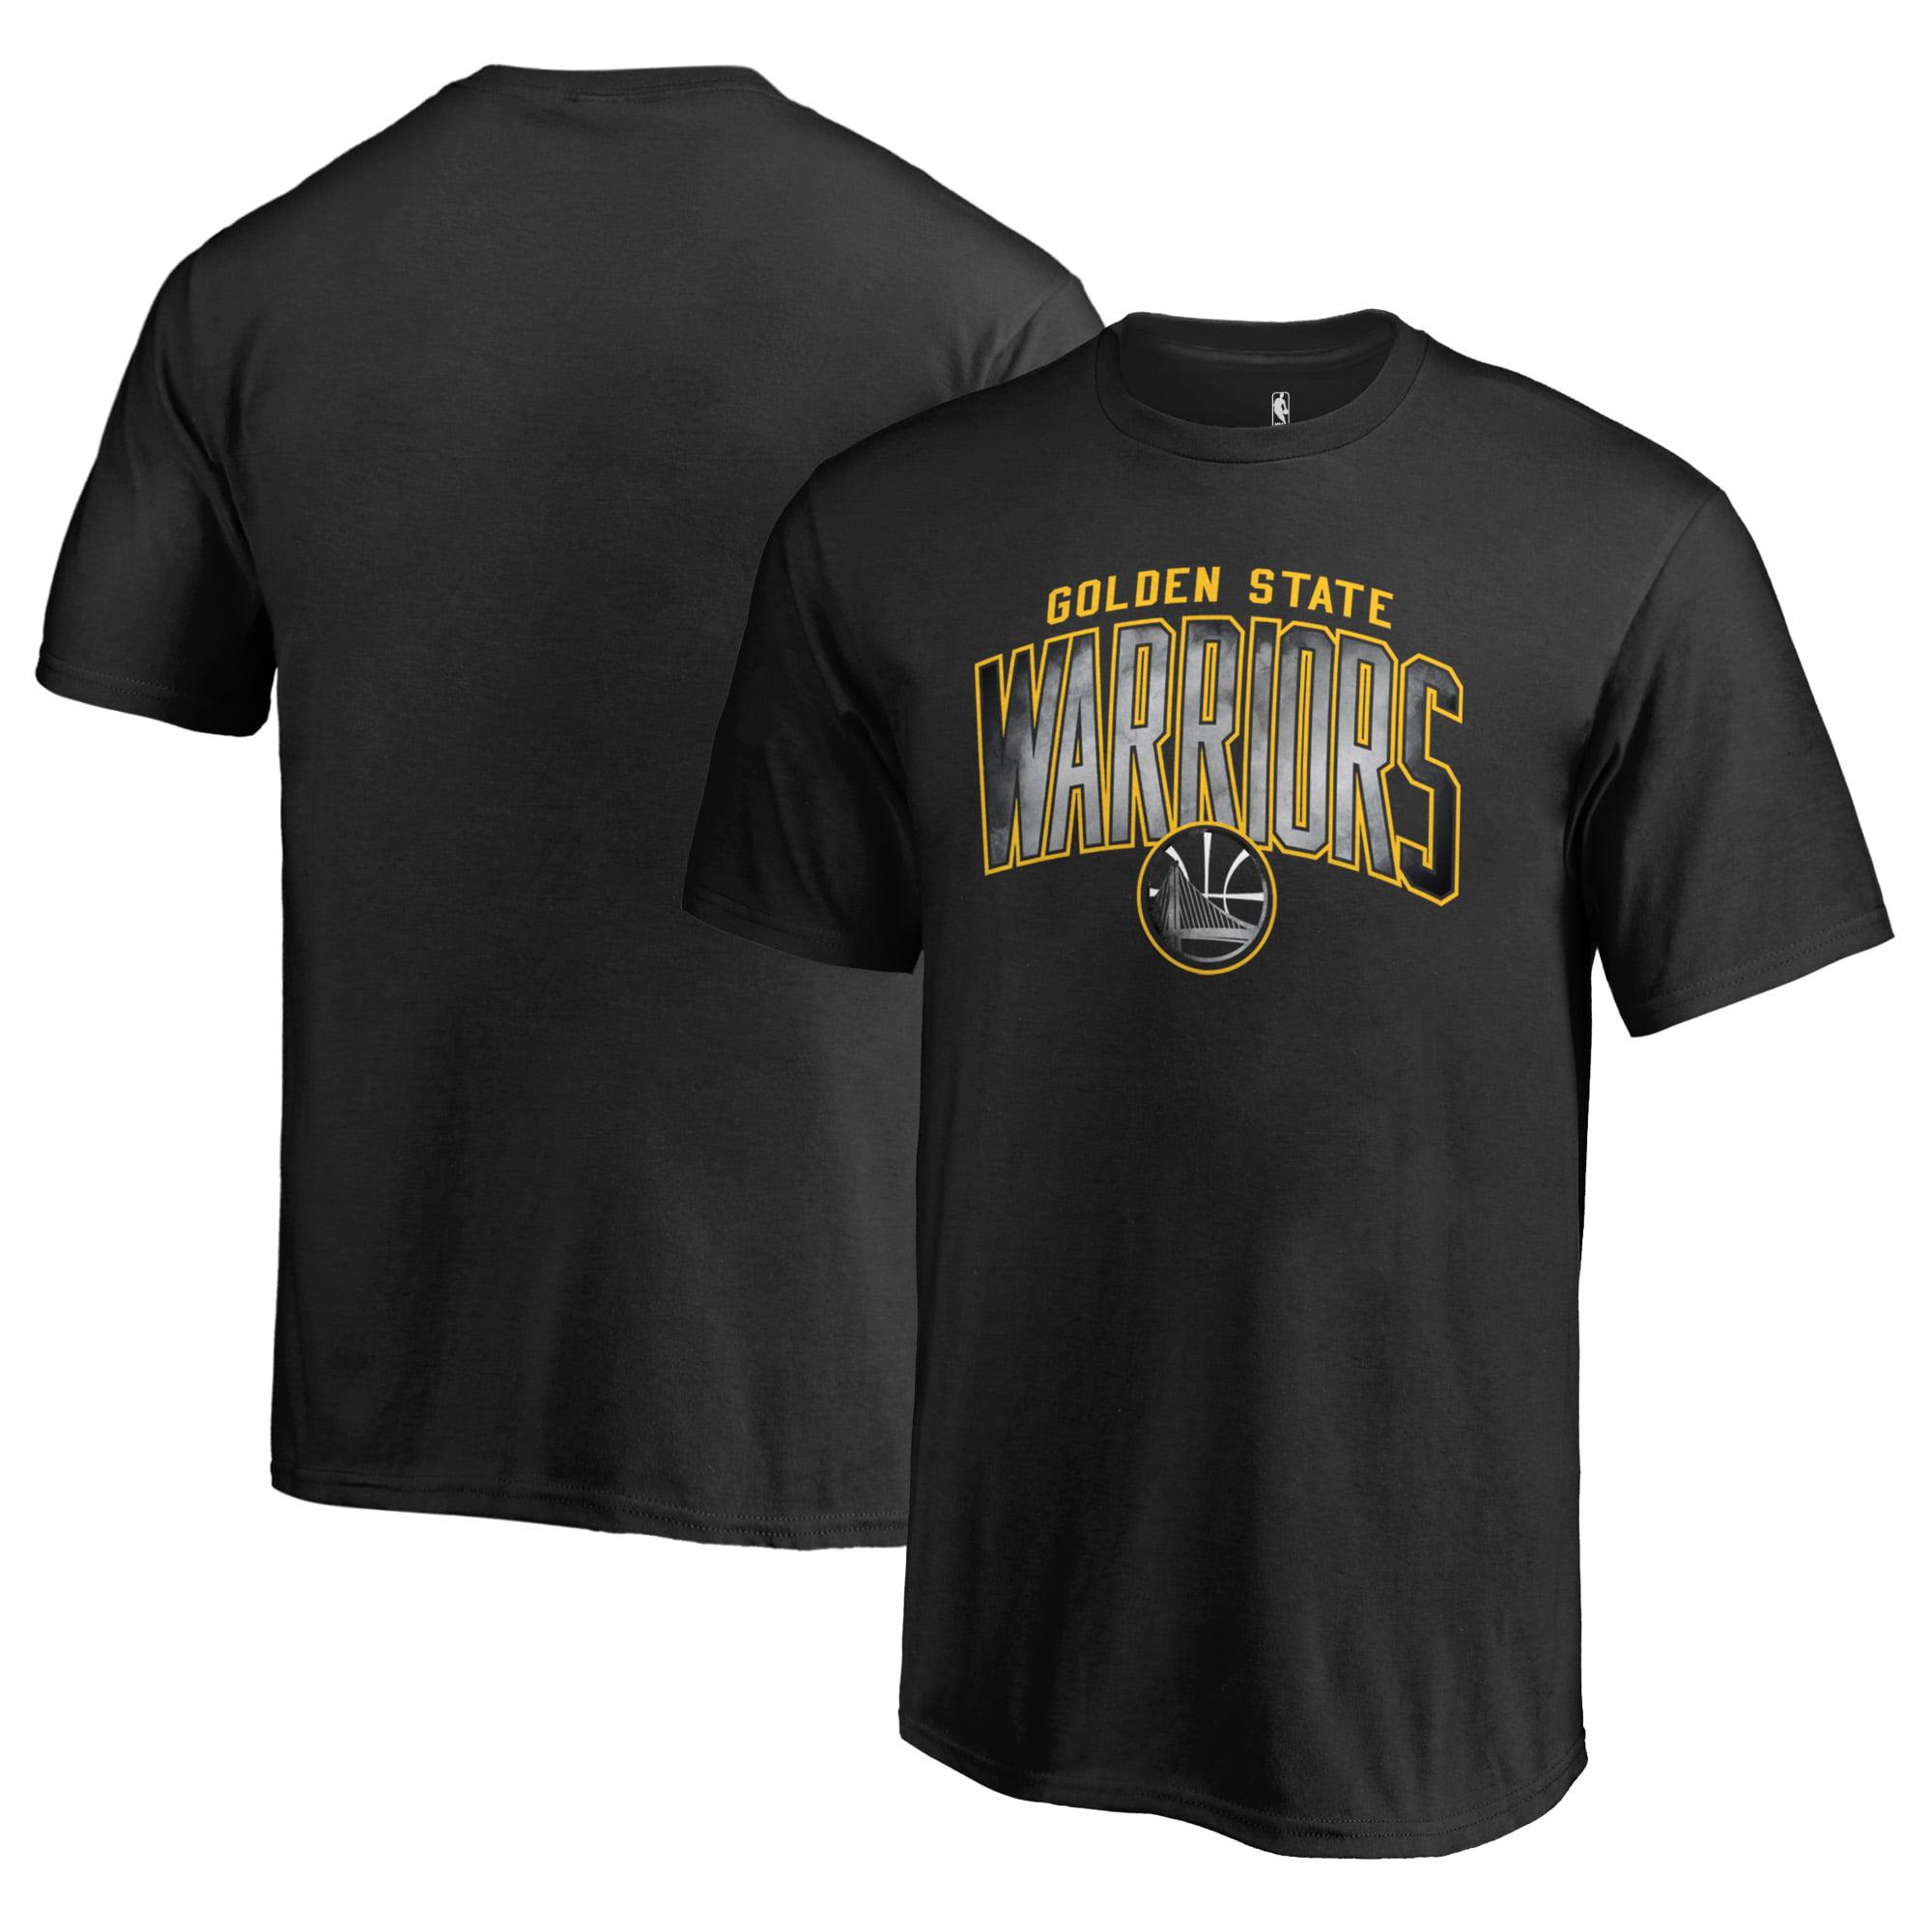 Golden State Warriors Fanatics Branded Youth Arch Smoke T-Shirt - Black